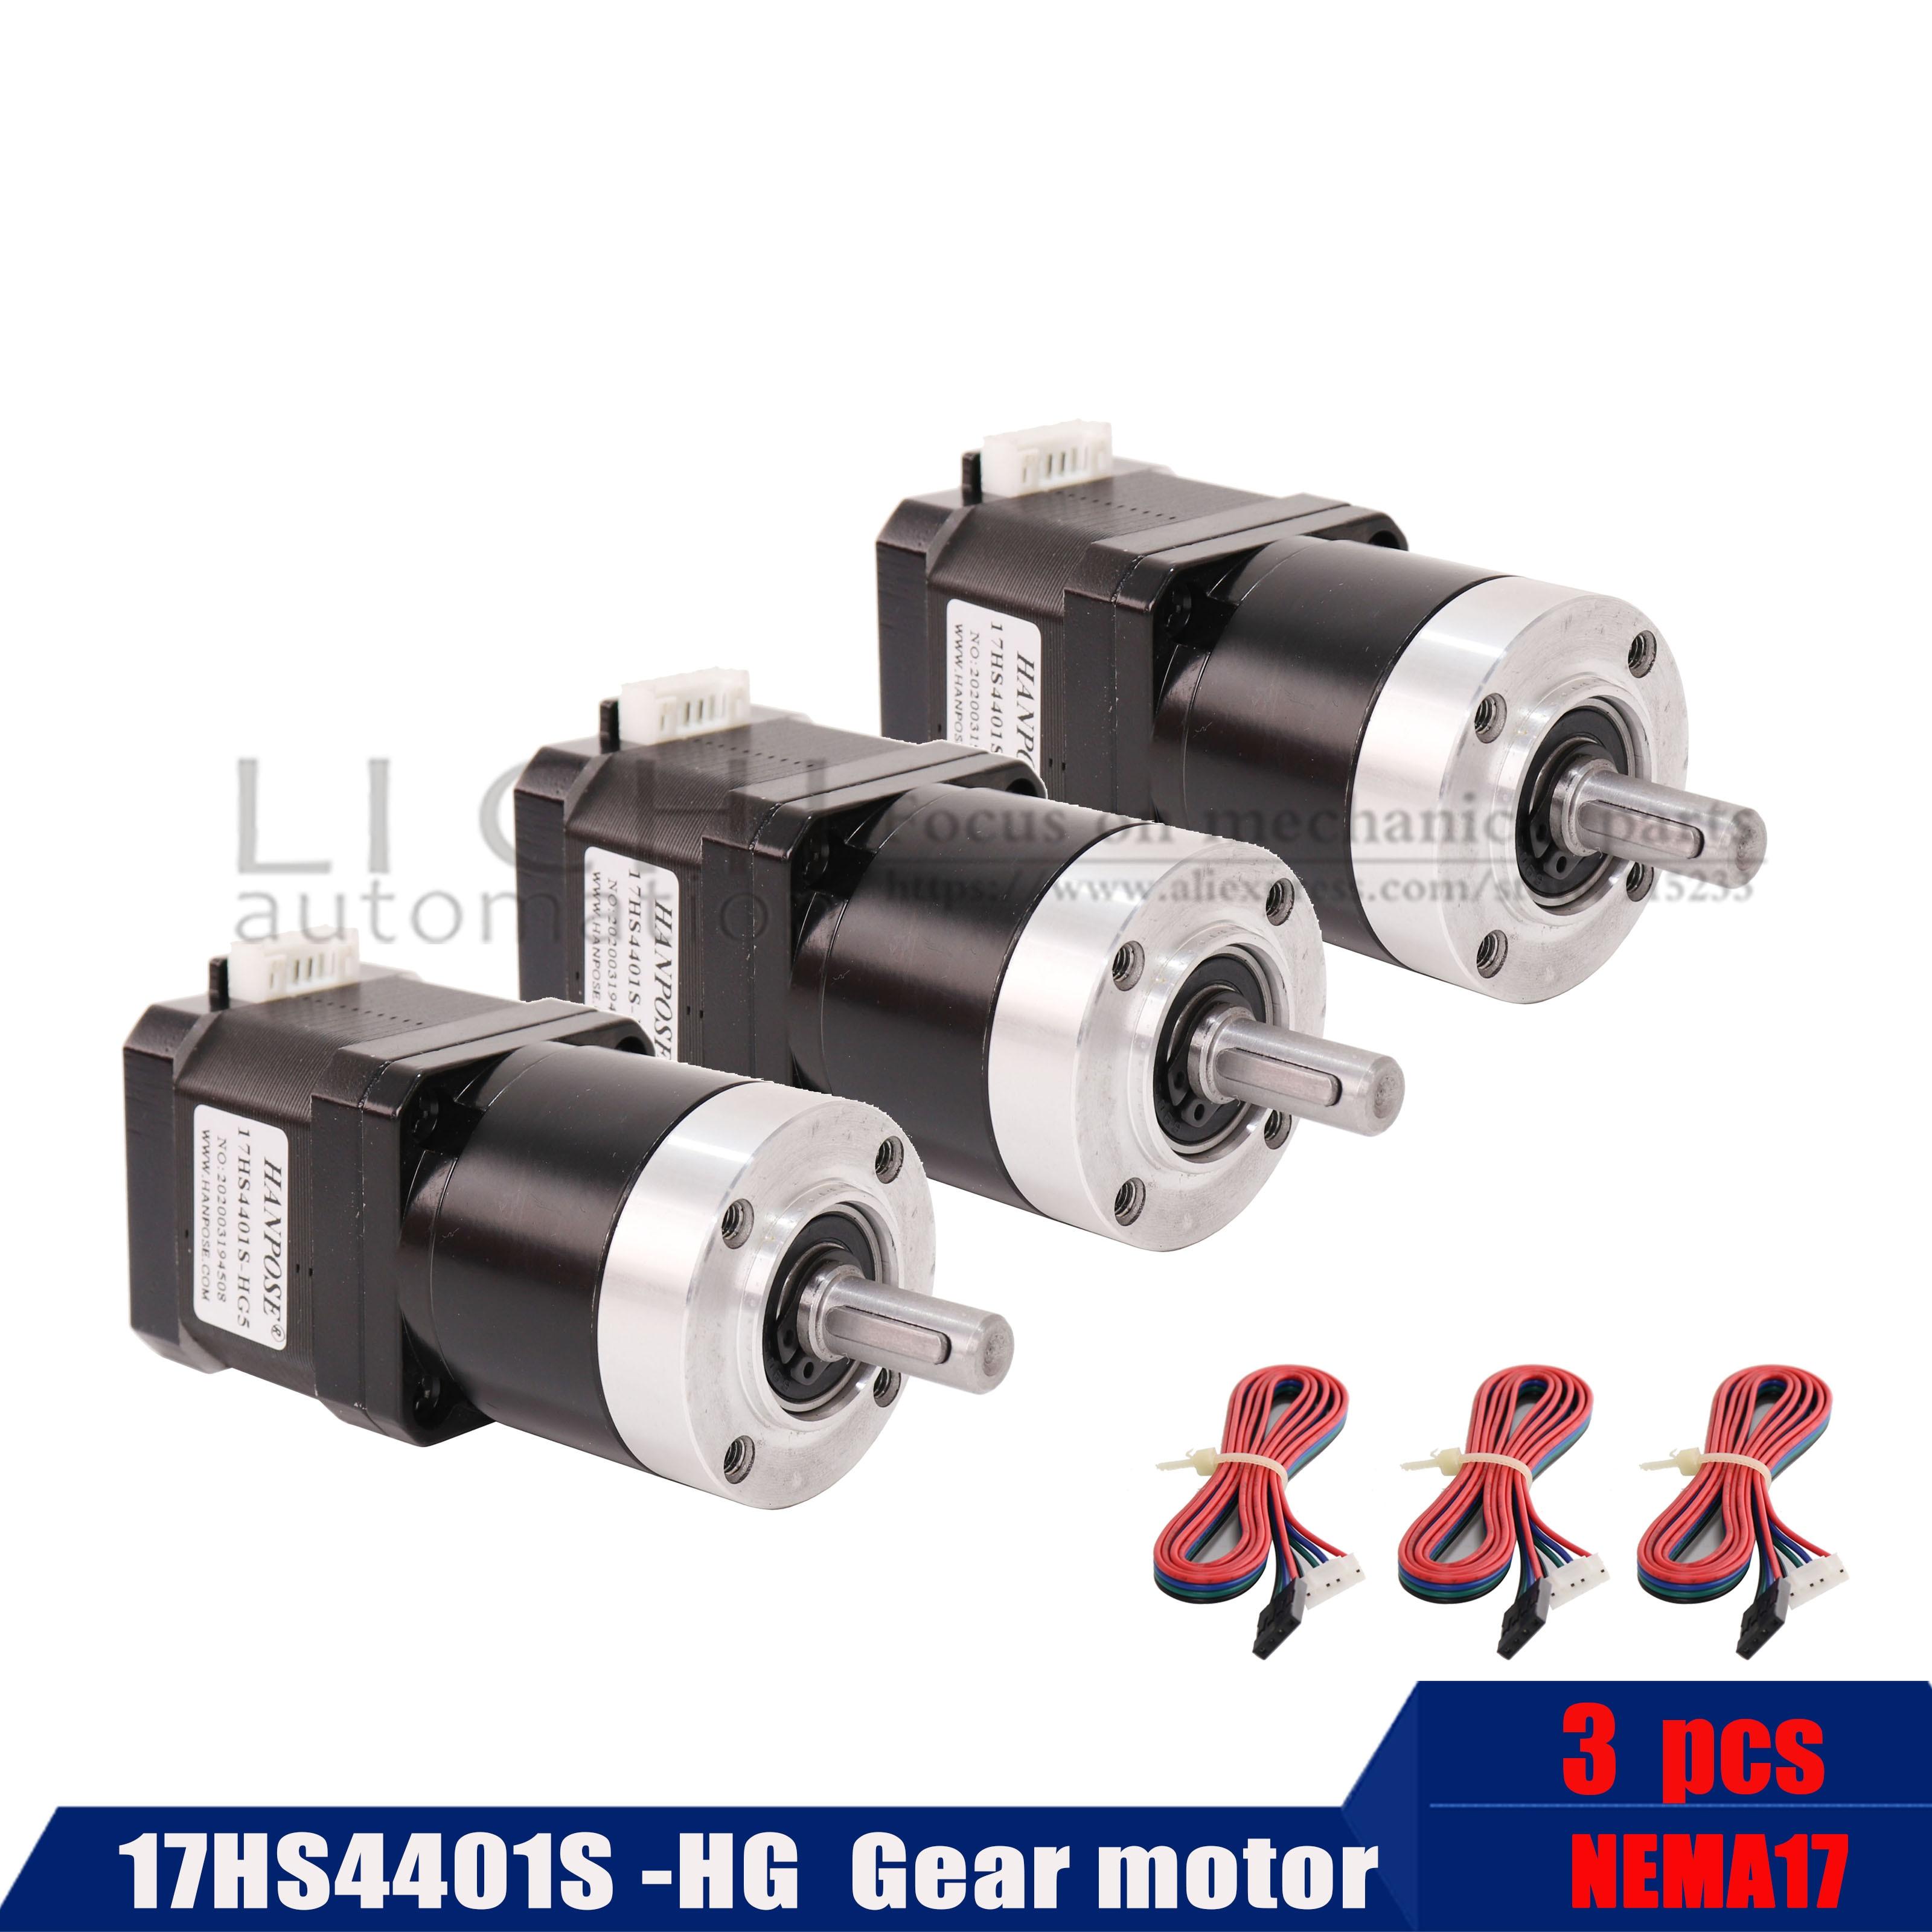 3pcs high precision reduction motor 17hs4401s Hg 42 motor body length 40mm planetary transmission ratio Hg 5-110-1